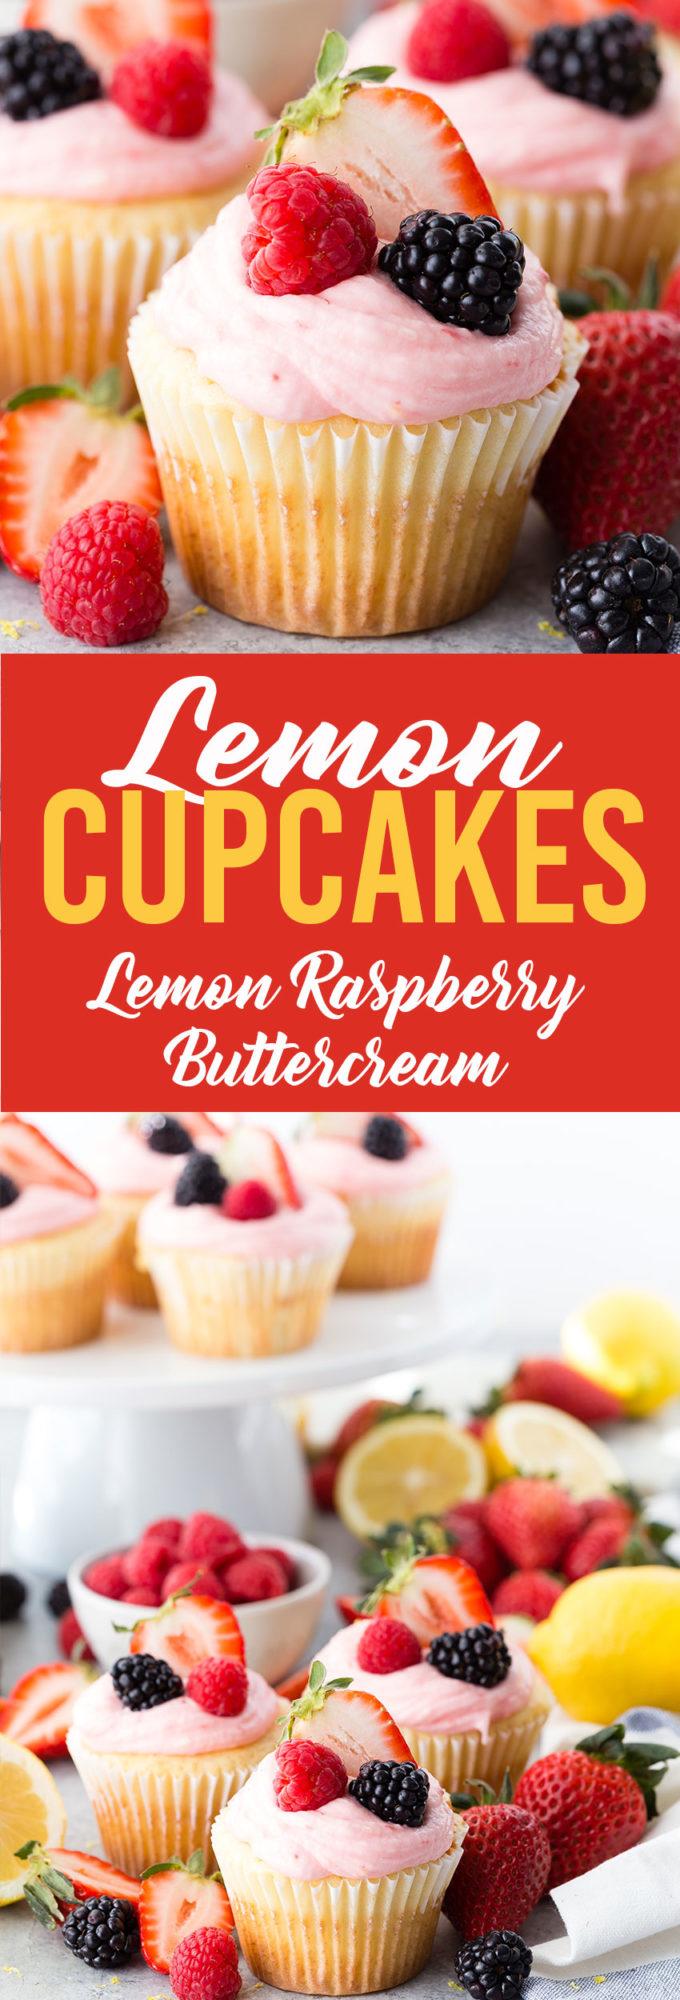 Lemon Cupcakes with Lemon Raspberry Buttercream